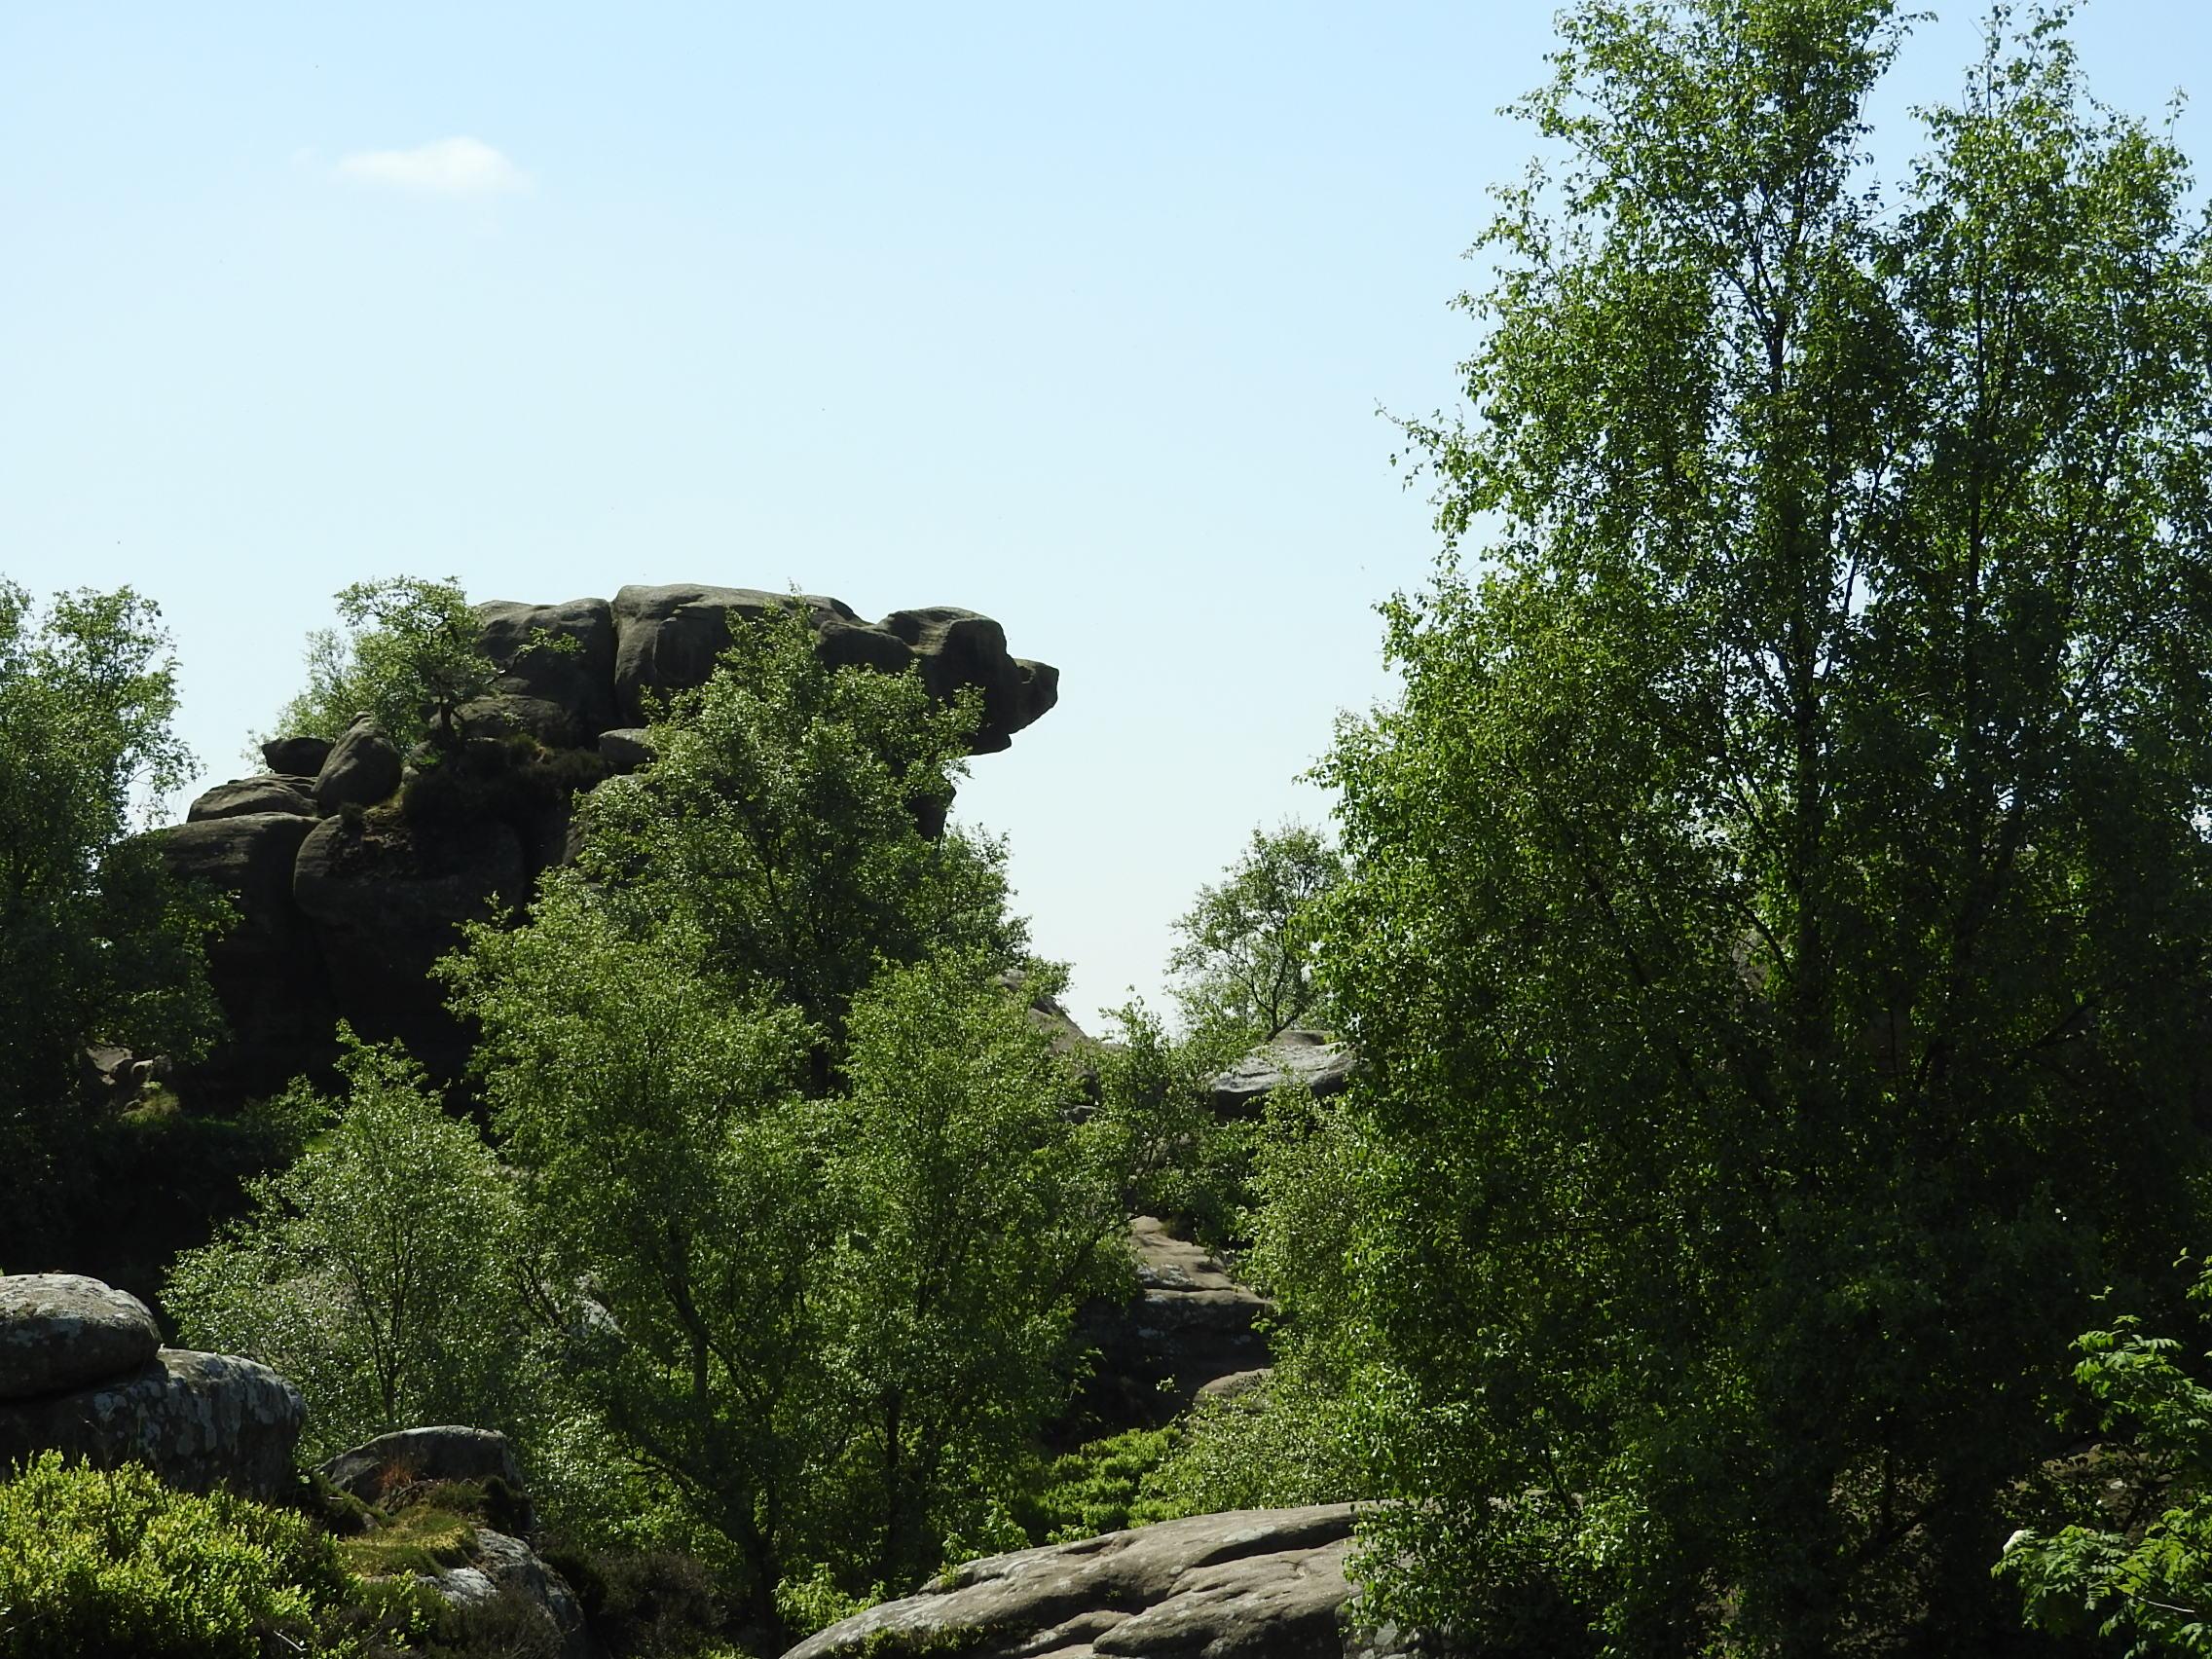 Brimham Rocks the guard dog